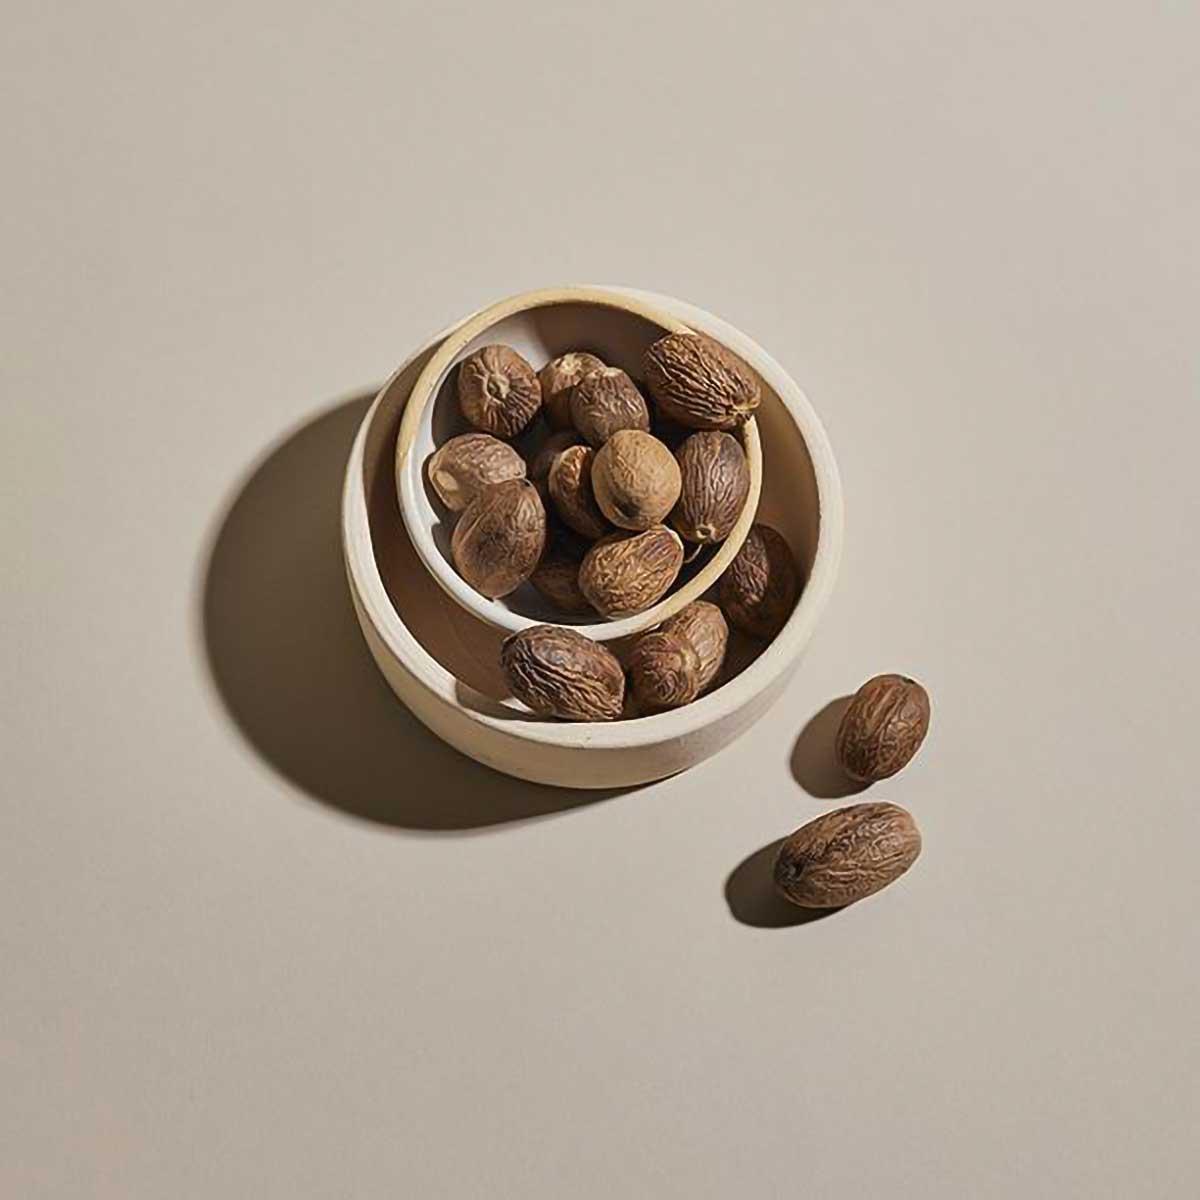 Whole Nutmeg in Dish